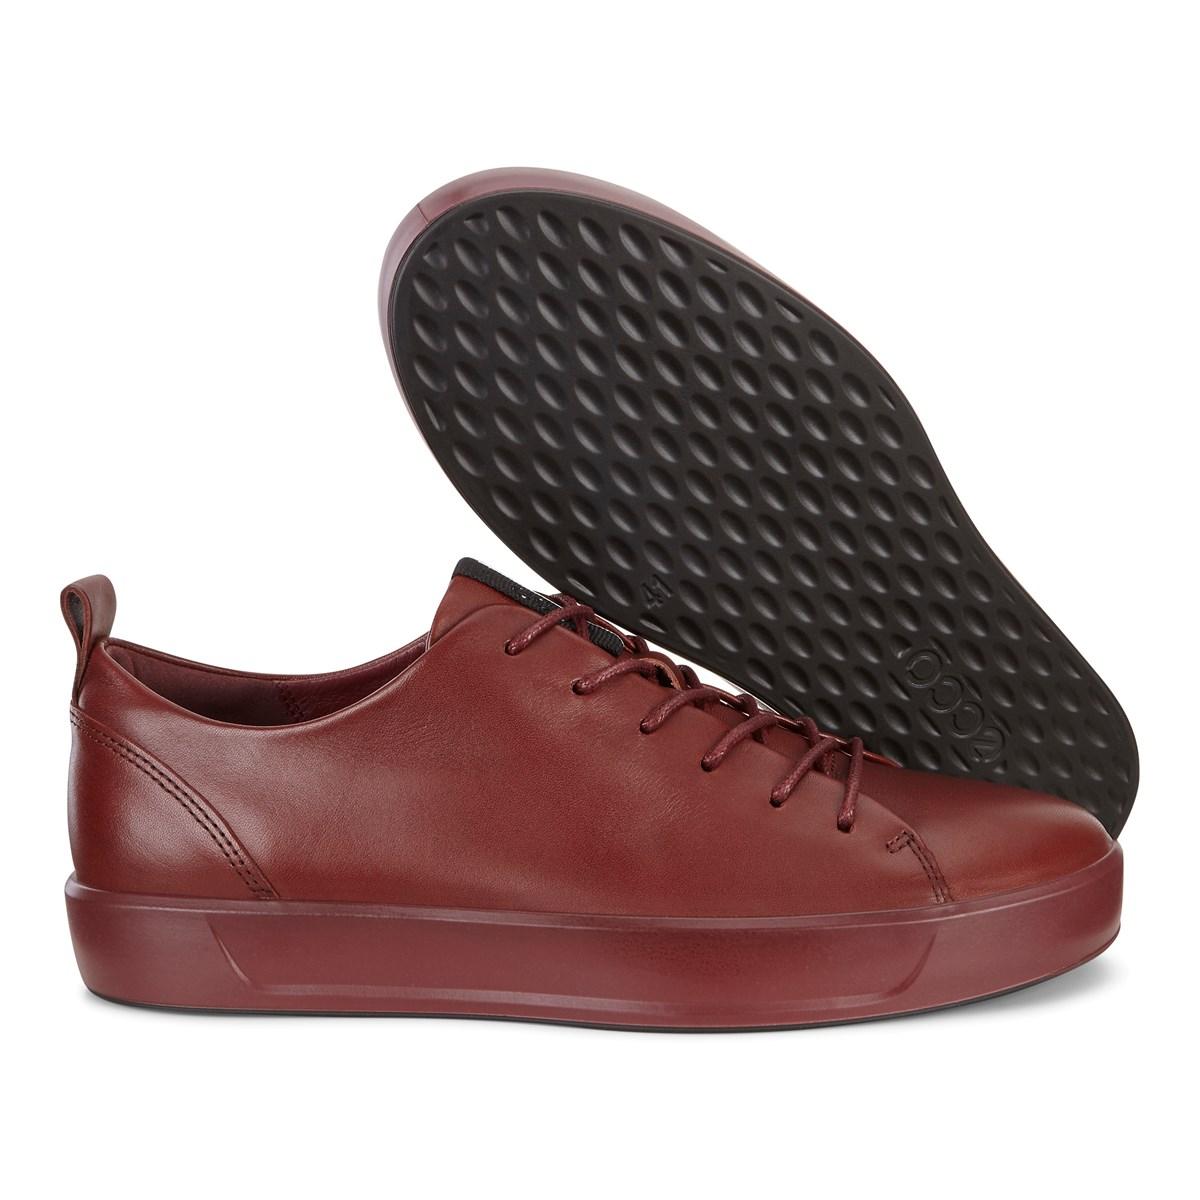 b60782769b11 Soft 8 - SOFT 8 MENS - ECCO Shoes NZ